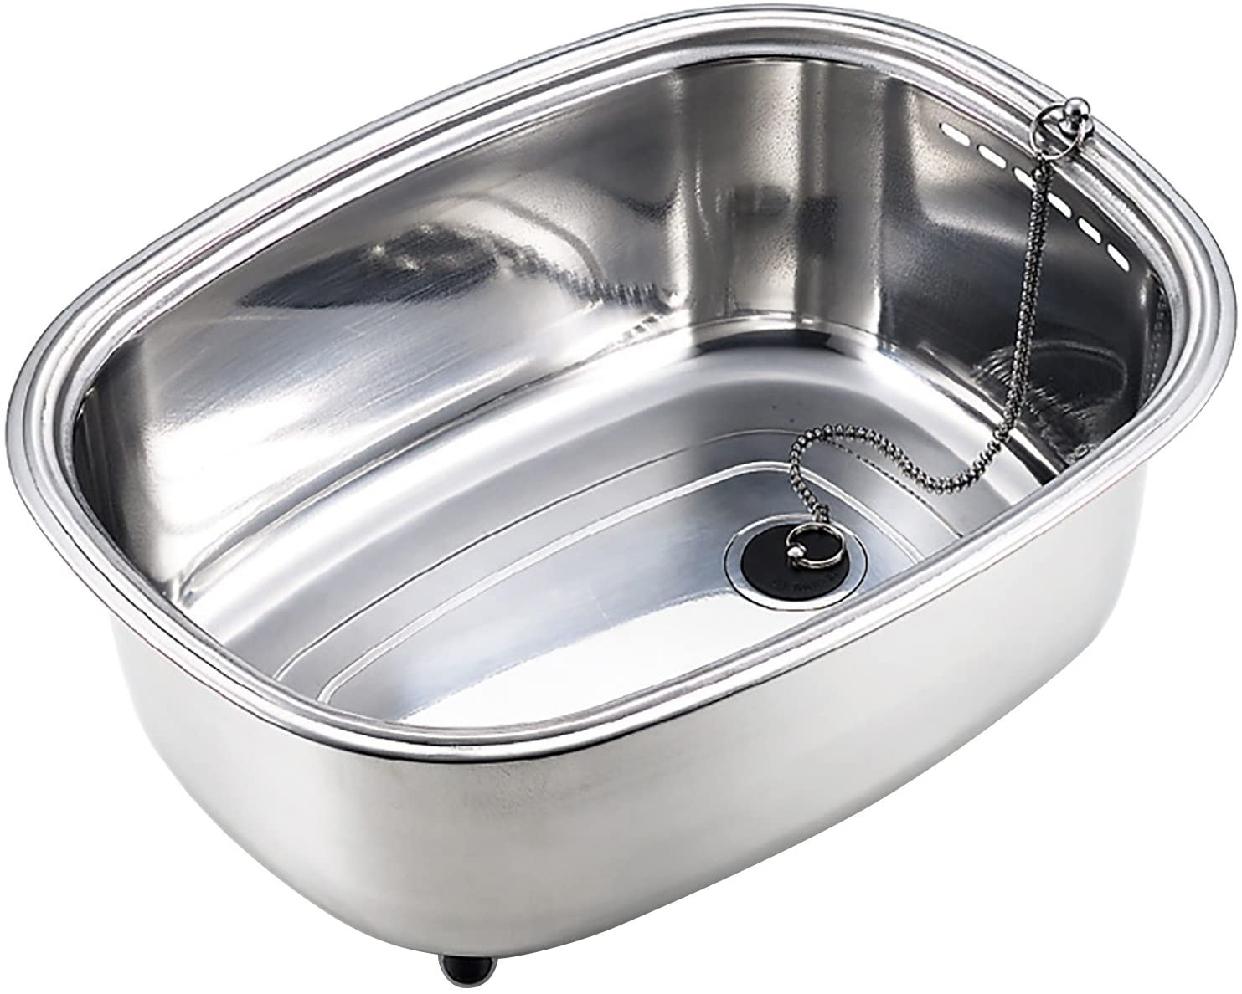 Arnest(アーネスト) 脚付 ステンレス 洗い桶 中栓付き A-75435 ステンレスの商品画像